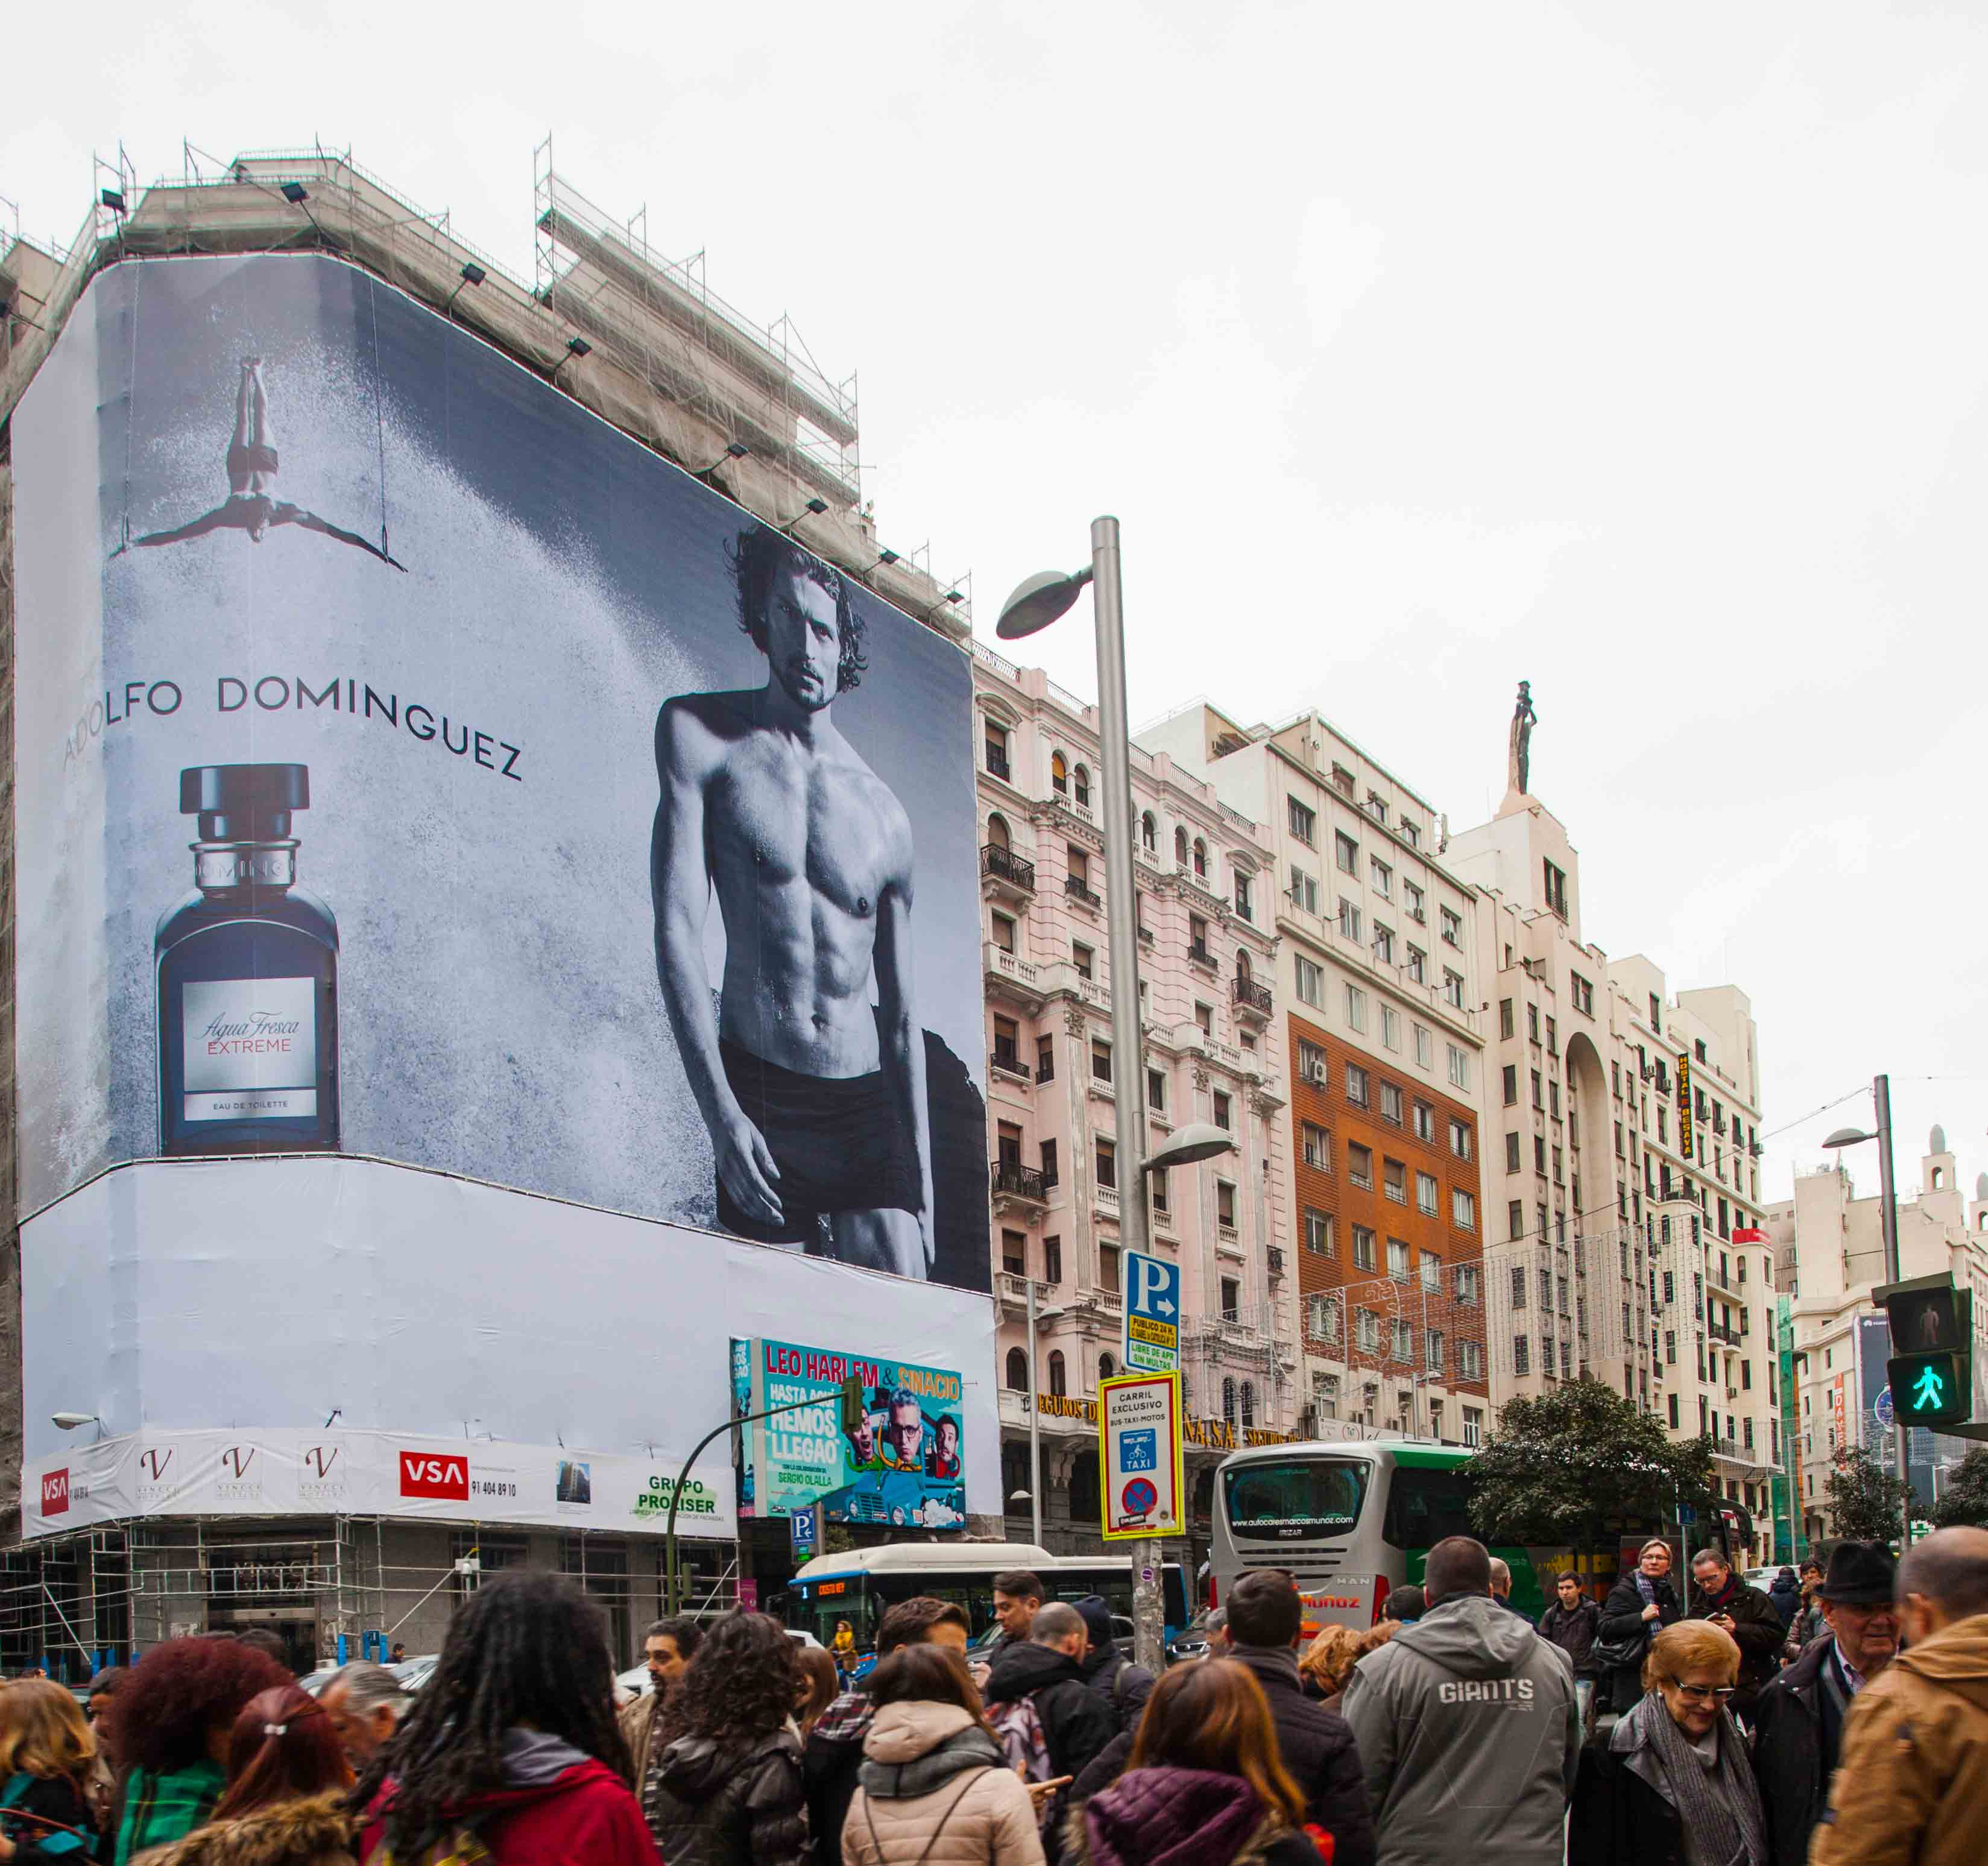 lona-publicitaria-madrid-gran-via-66-adolfo-dominguez-puig-vsa-comunicacion